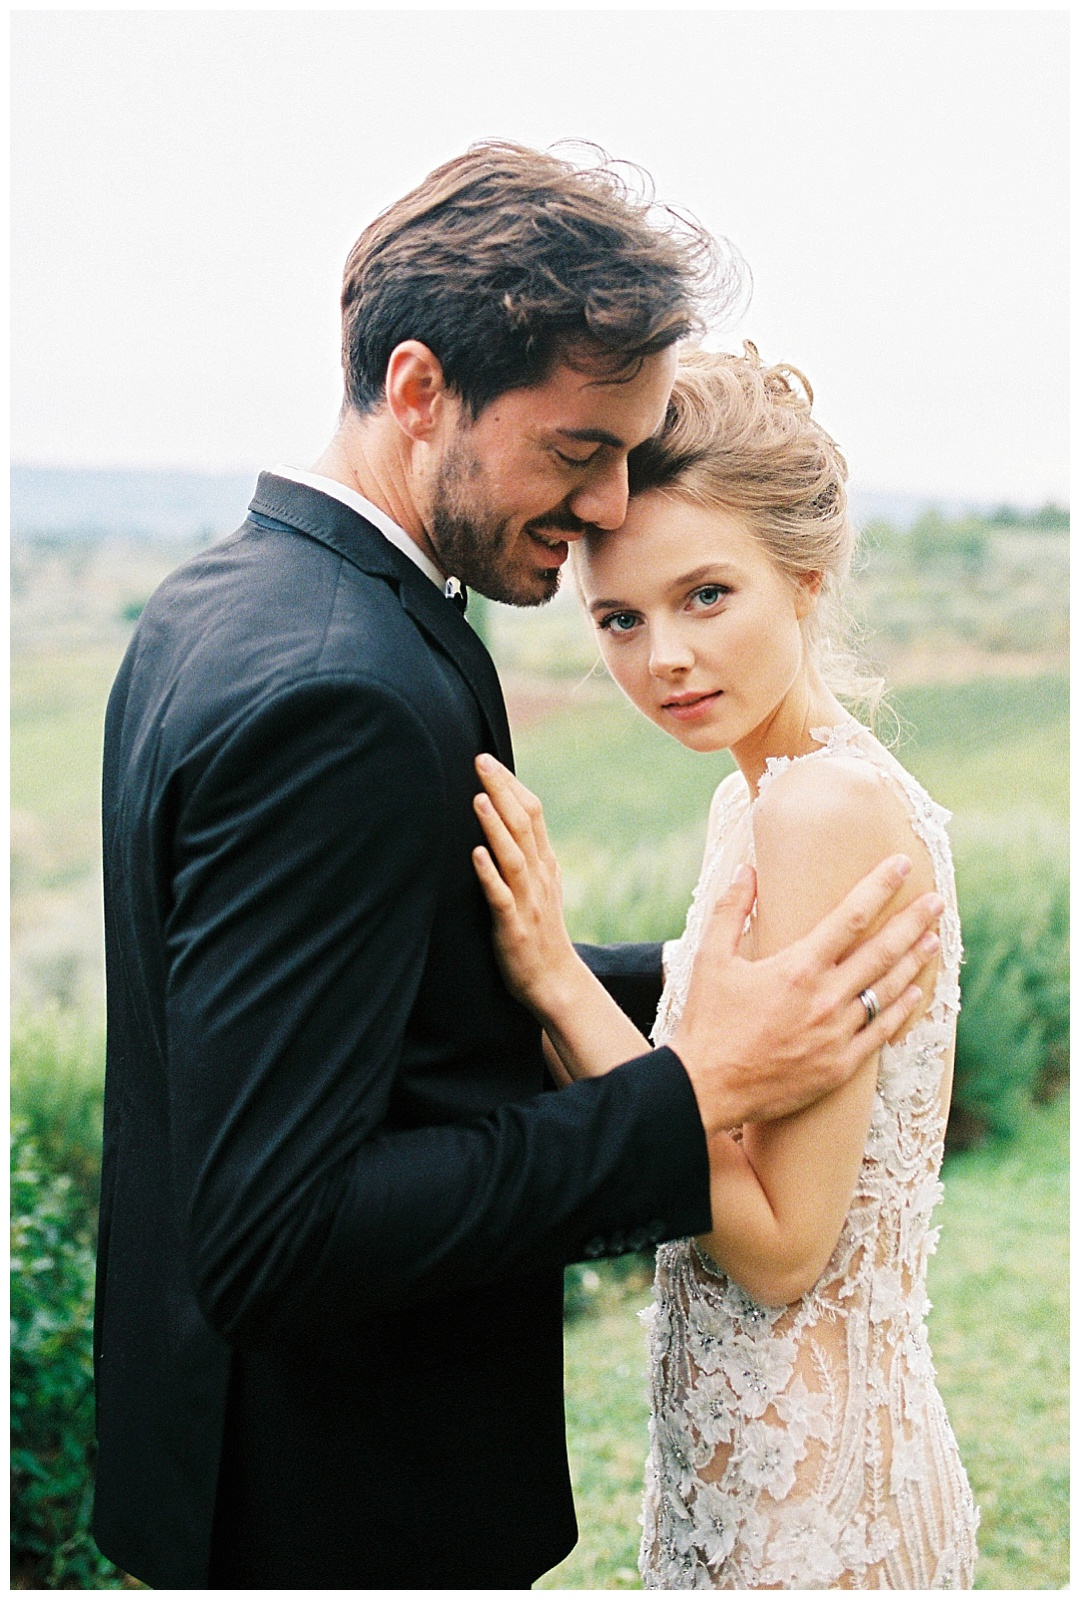 We_Can _Be_Heroes_alternative_wedding_photographer_Tuscany_wedding_film_0013